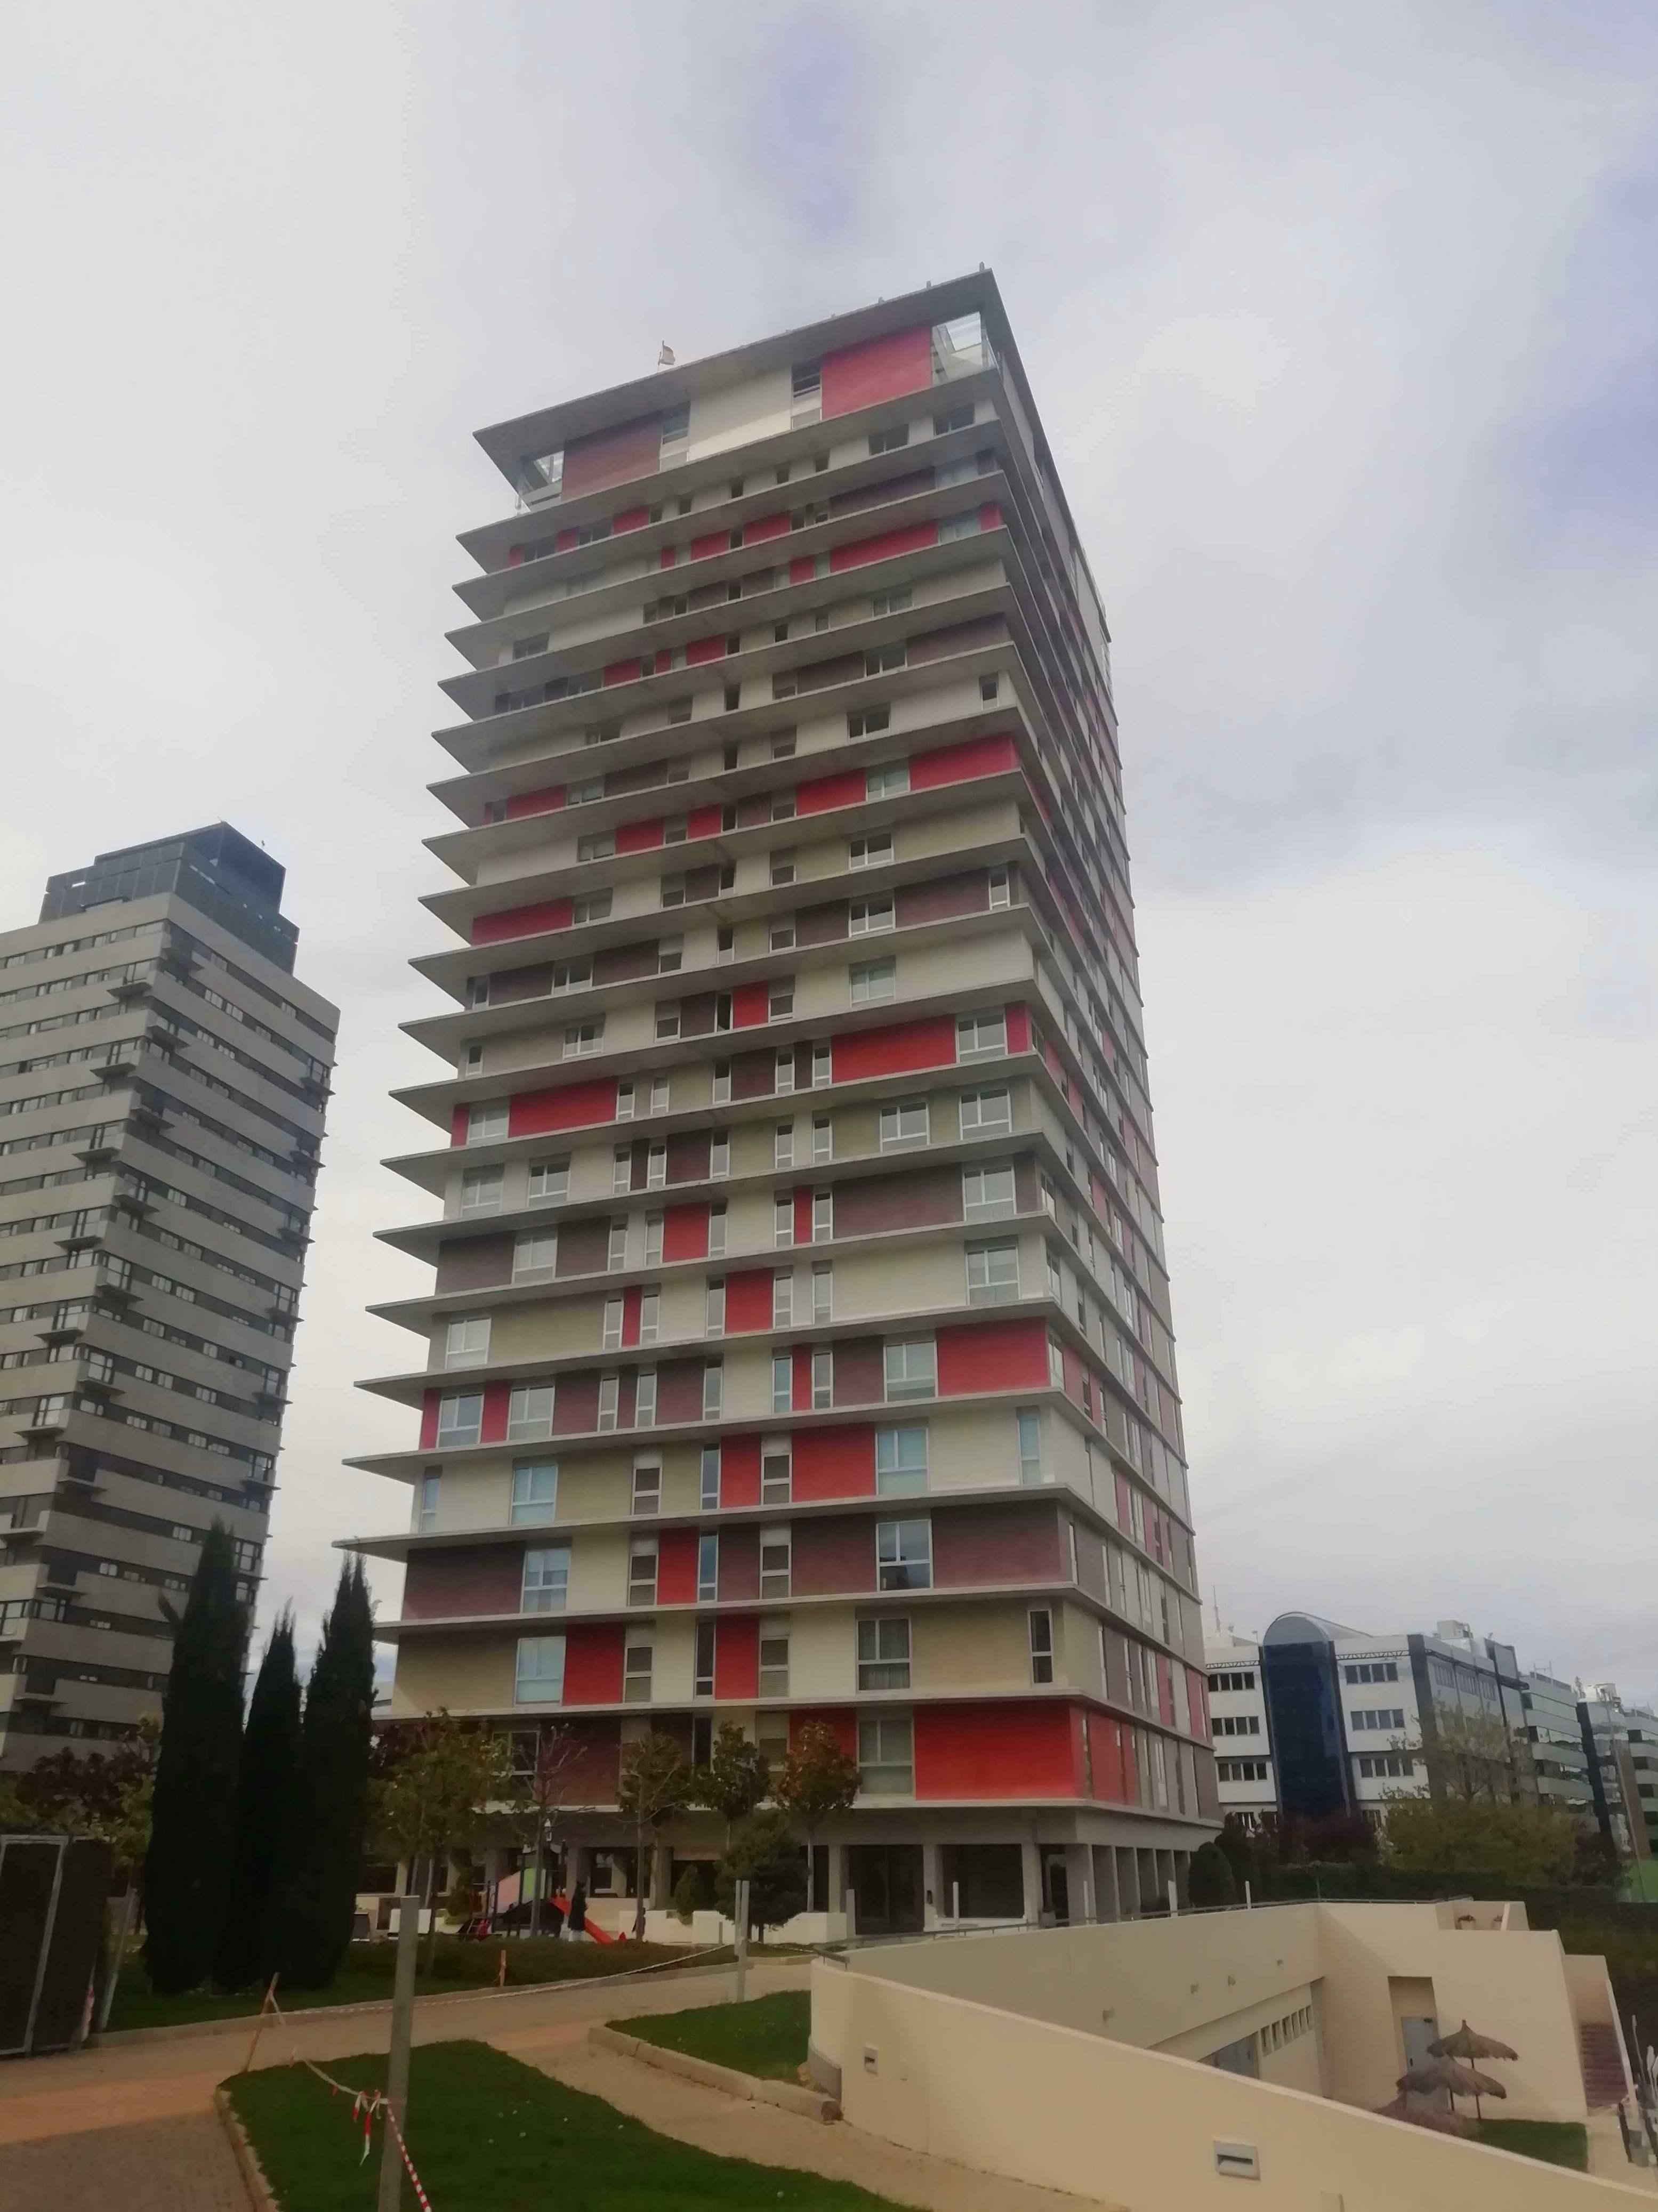 El edificio de viviendas 'Panorama. Isla de Chamartín', Premio de Urbanismo 2006